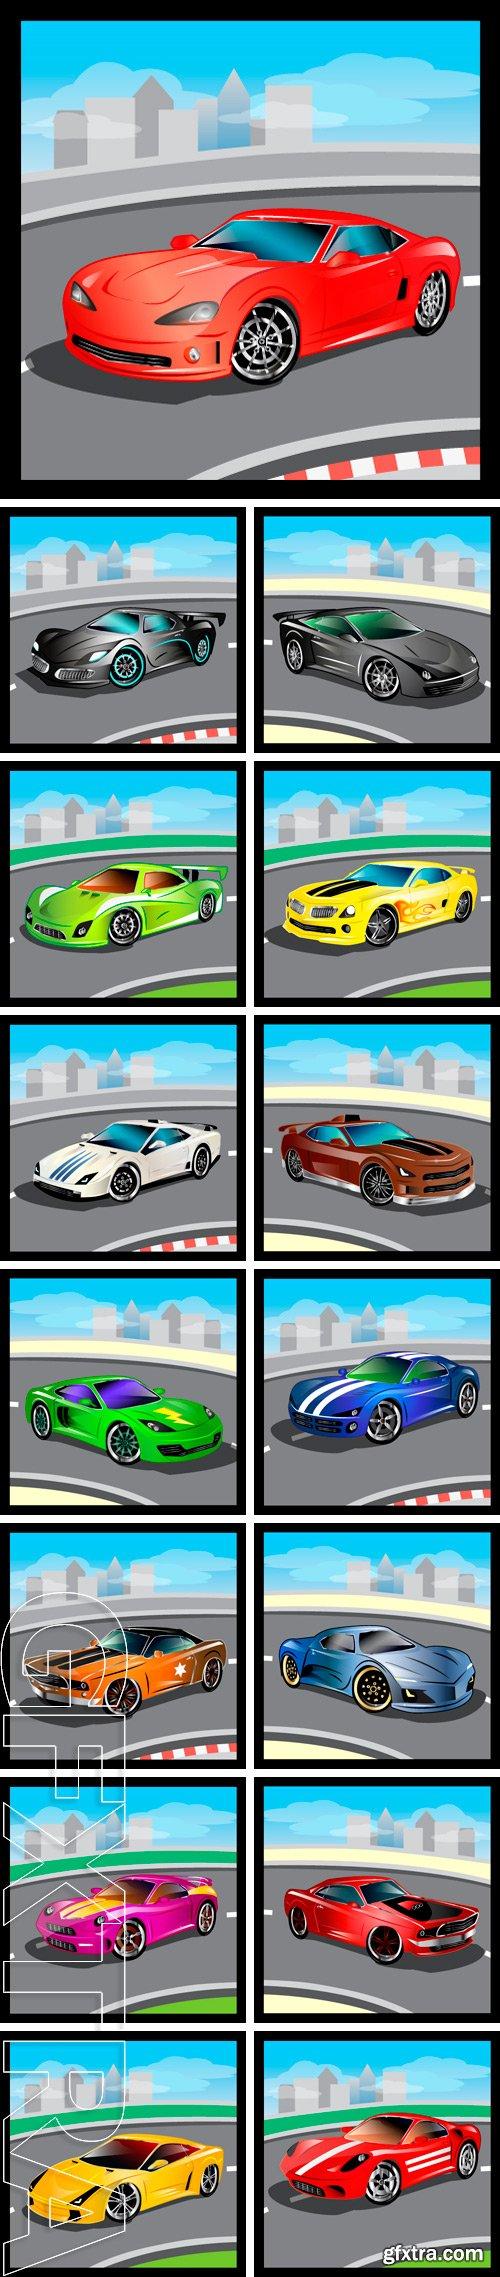 Stock Vectors - Luxury vector cartoon sports car